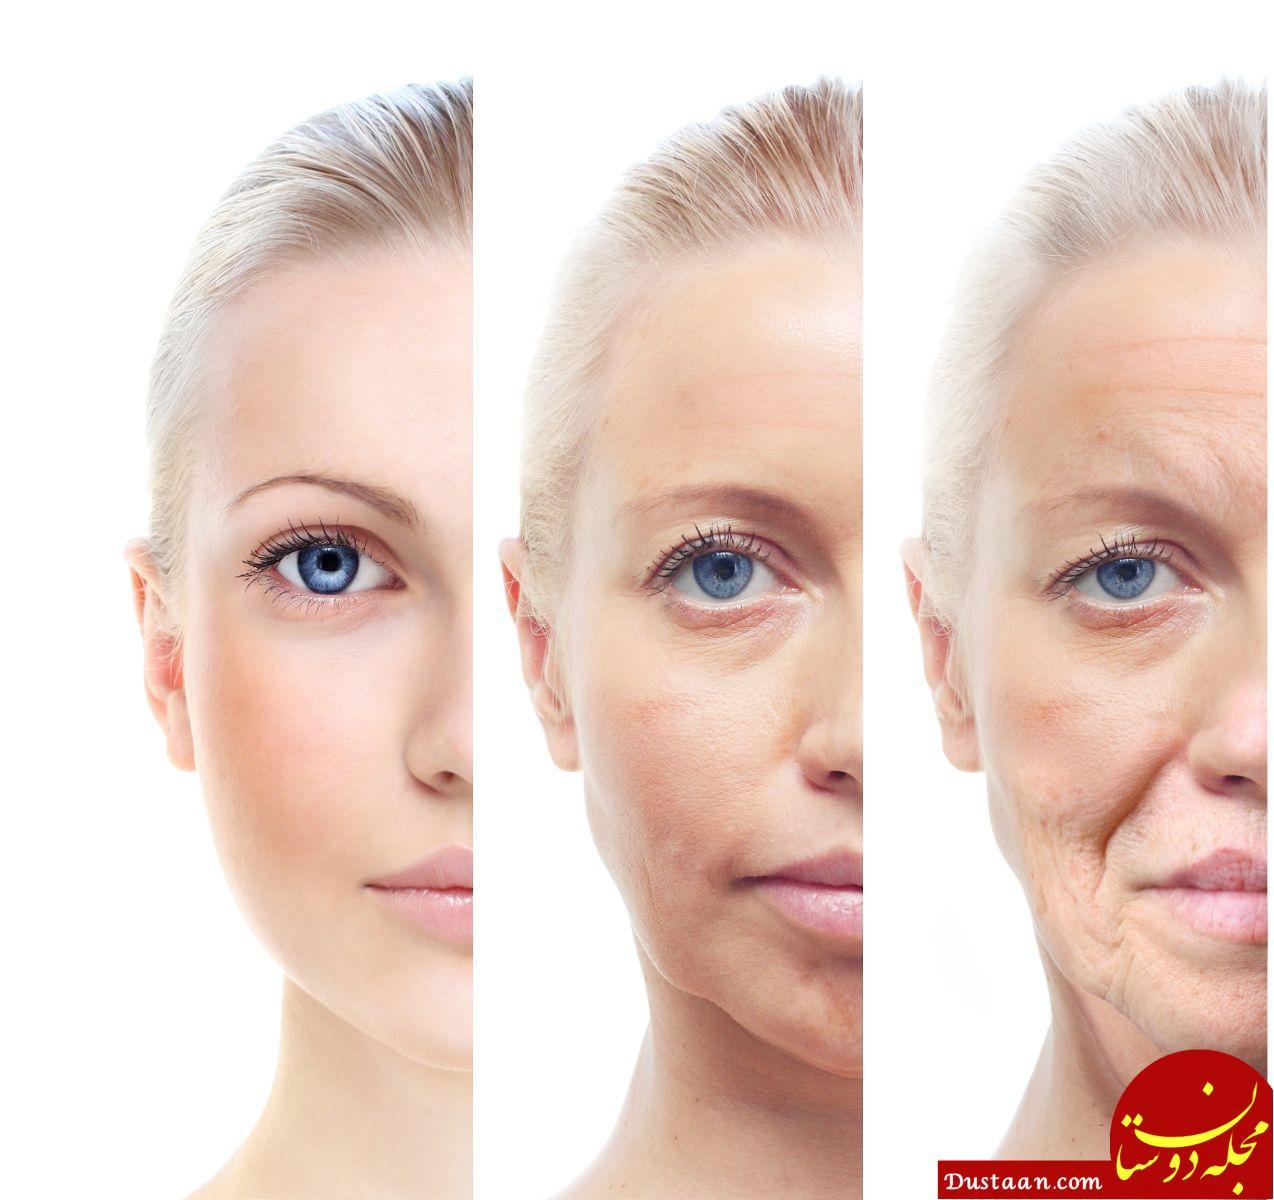 www.dustaan.com 7 رفتار اشتباهی که موجب پیری زودرس می شود!